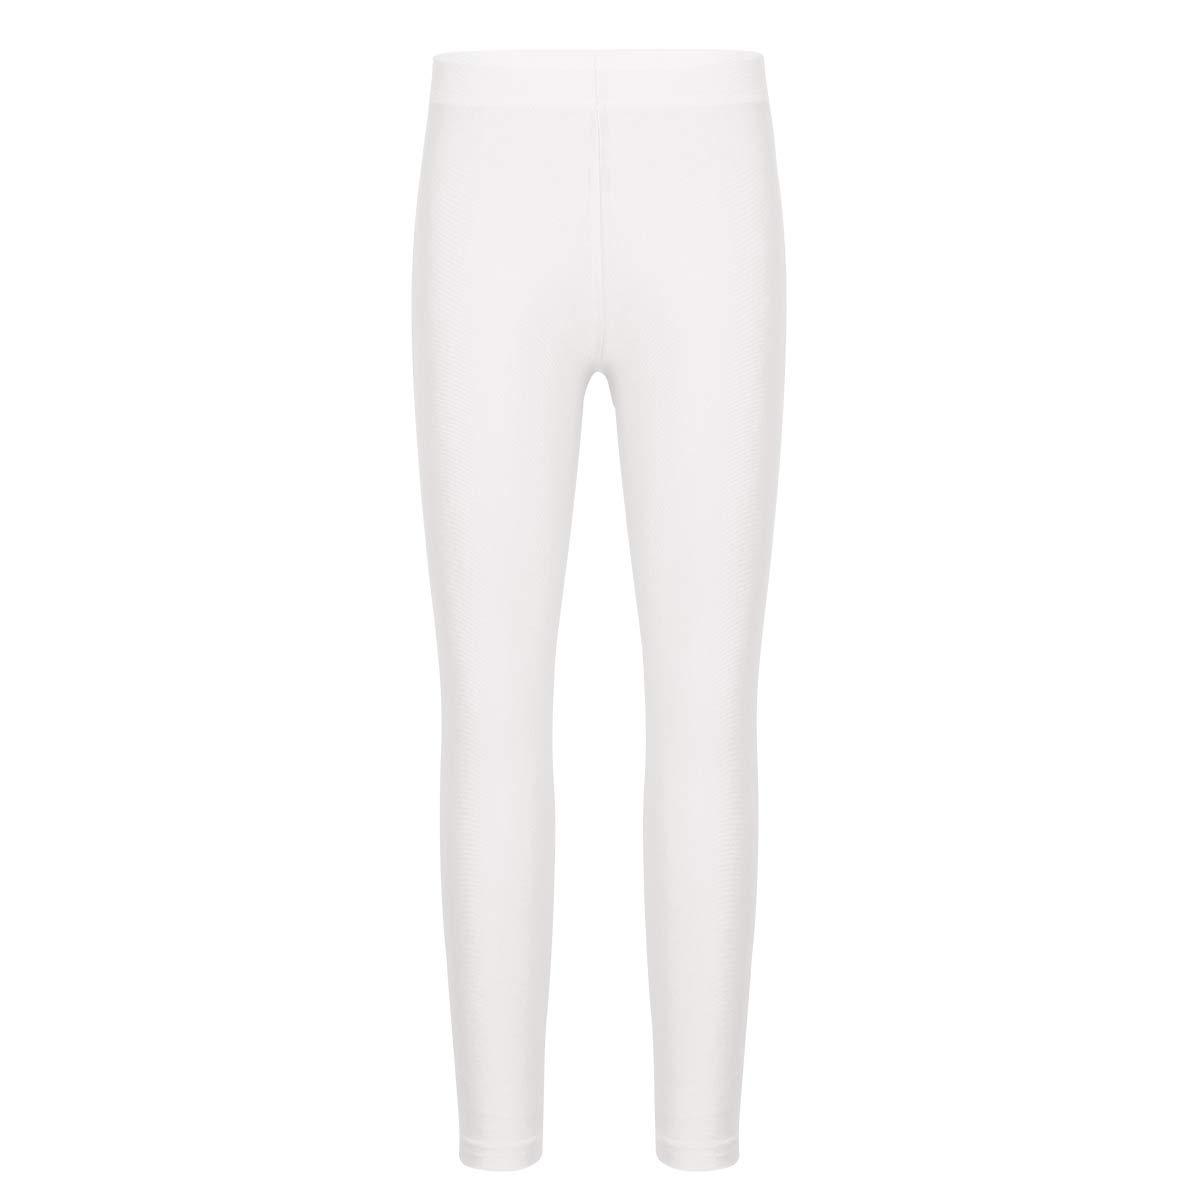 YiZYiF Kids Girls Ultra Soft Spandex Ankle Length Seamless Leggings Tights Pants White 4-5